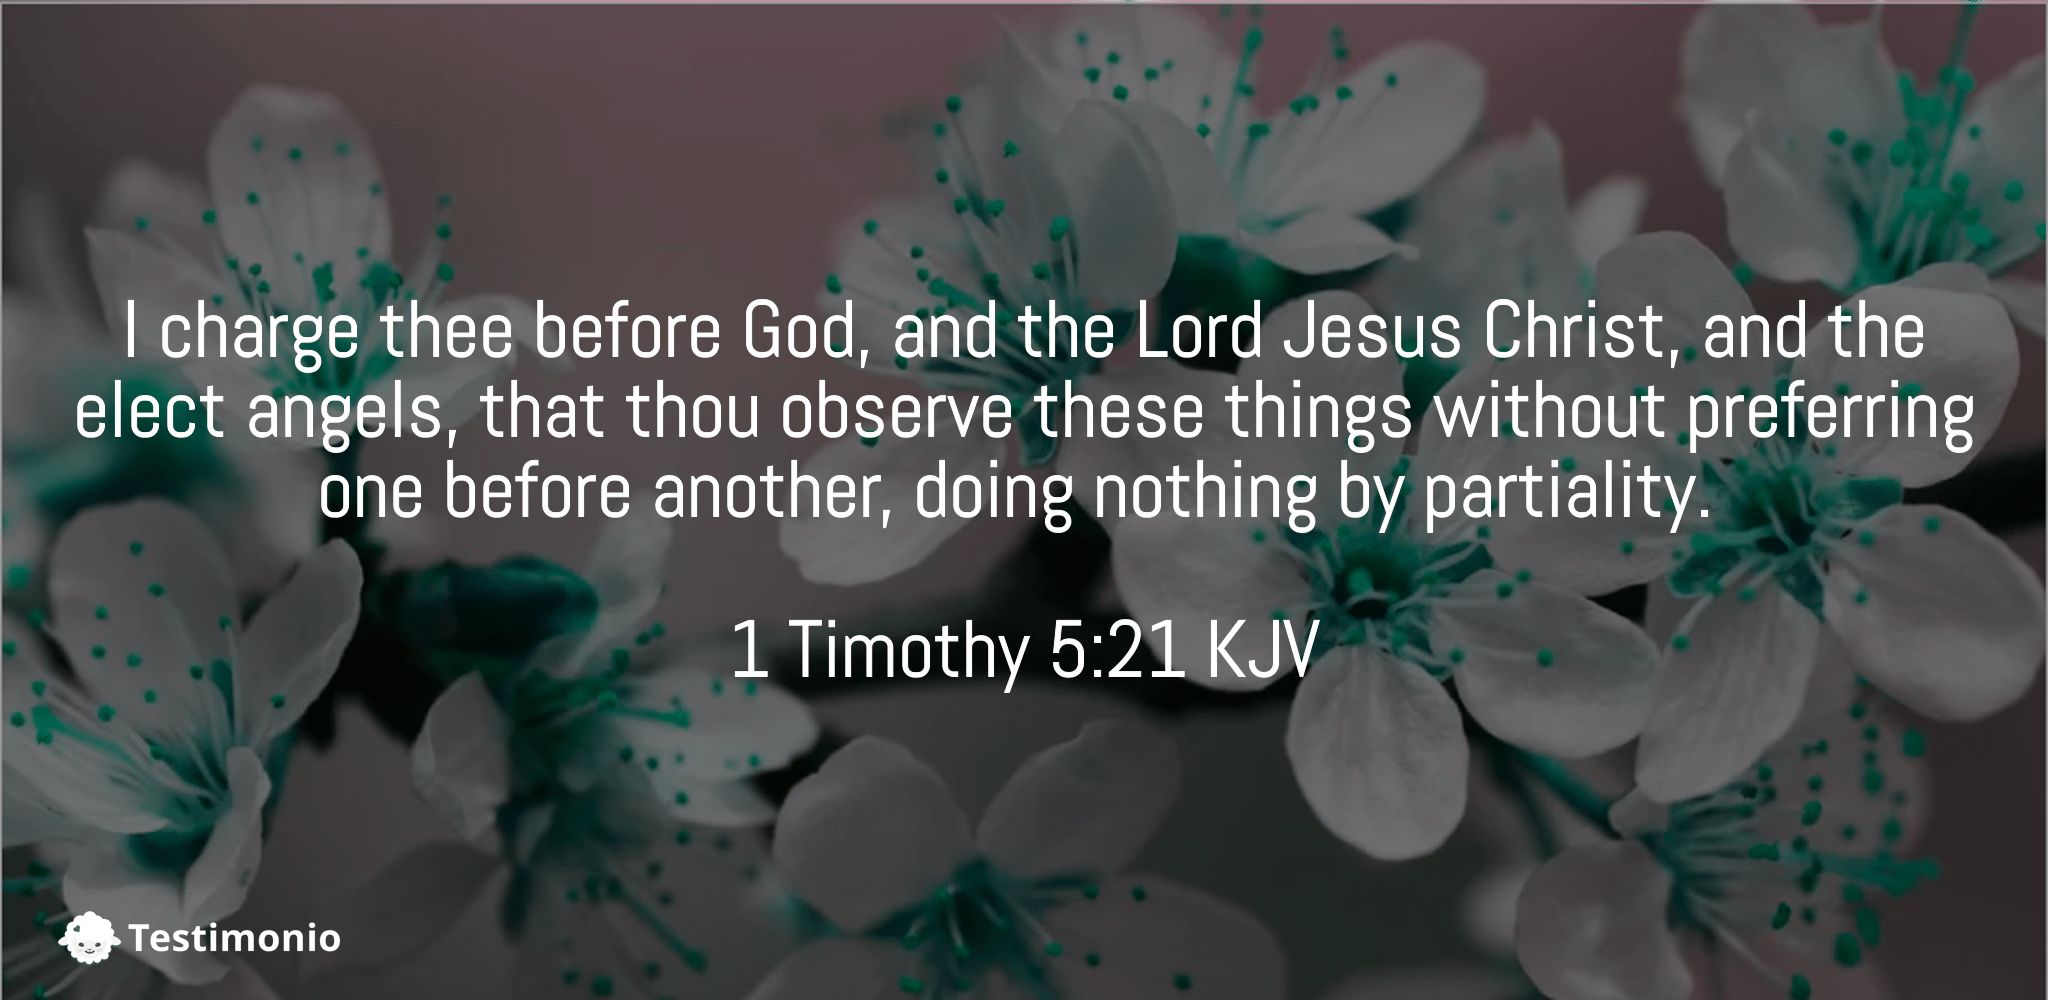 1 Timothy 5:21